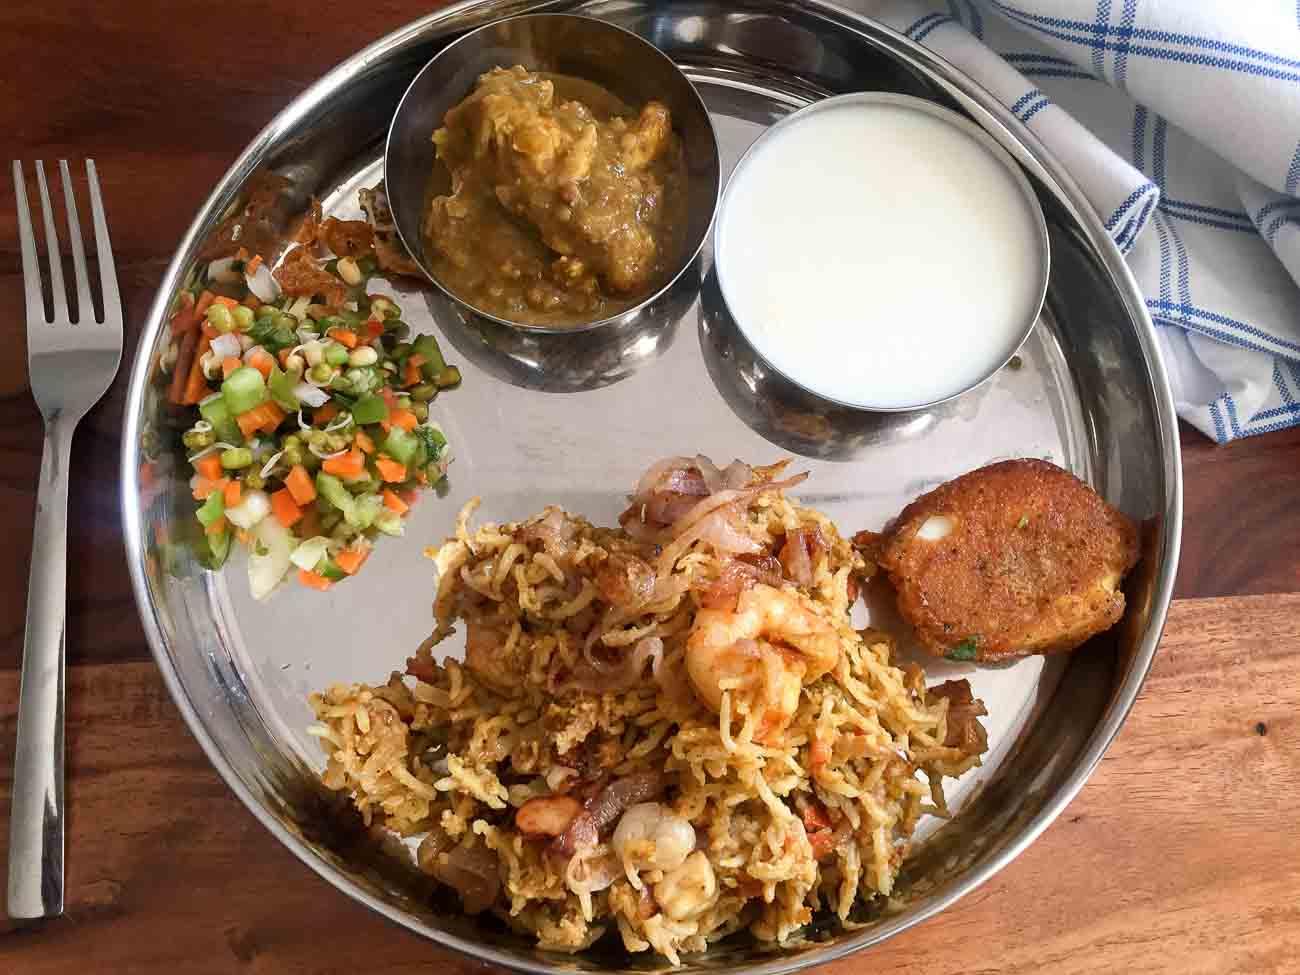 Everyday meal ideas by archanas kitchen everyday meal plate prawn biryani murgh aur masoor dal salad curd forumfinder Gallery